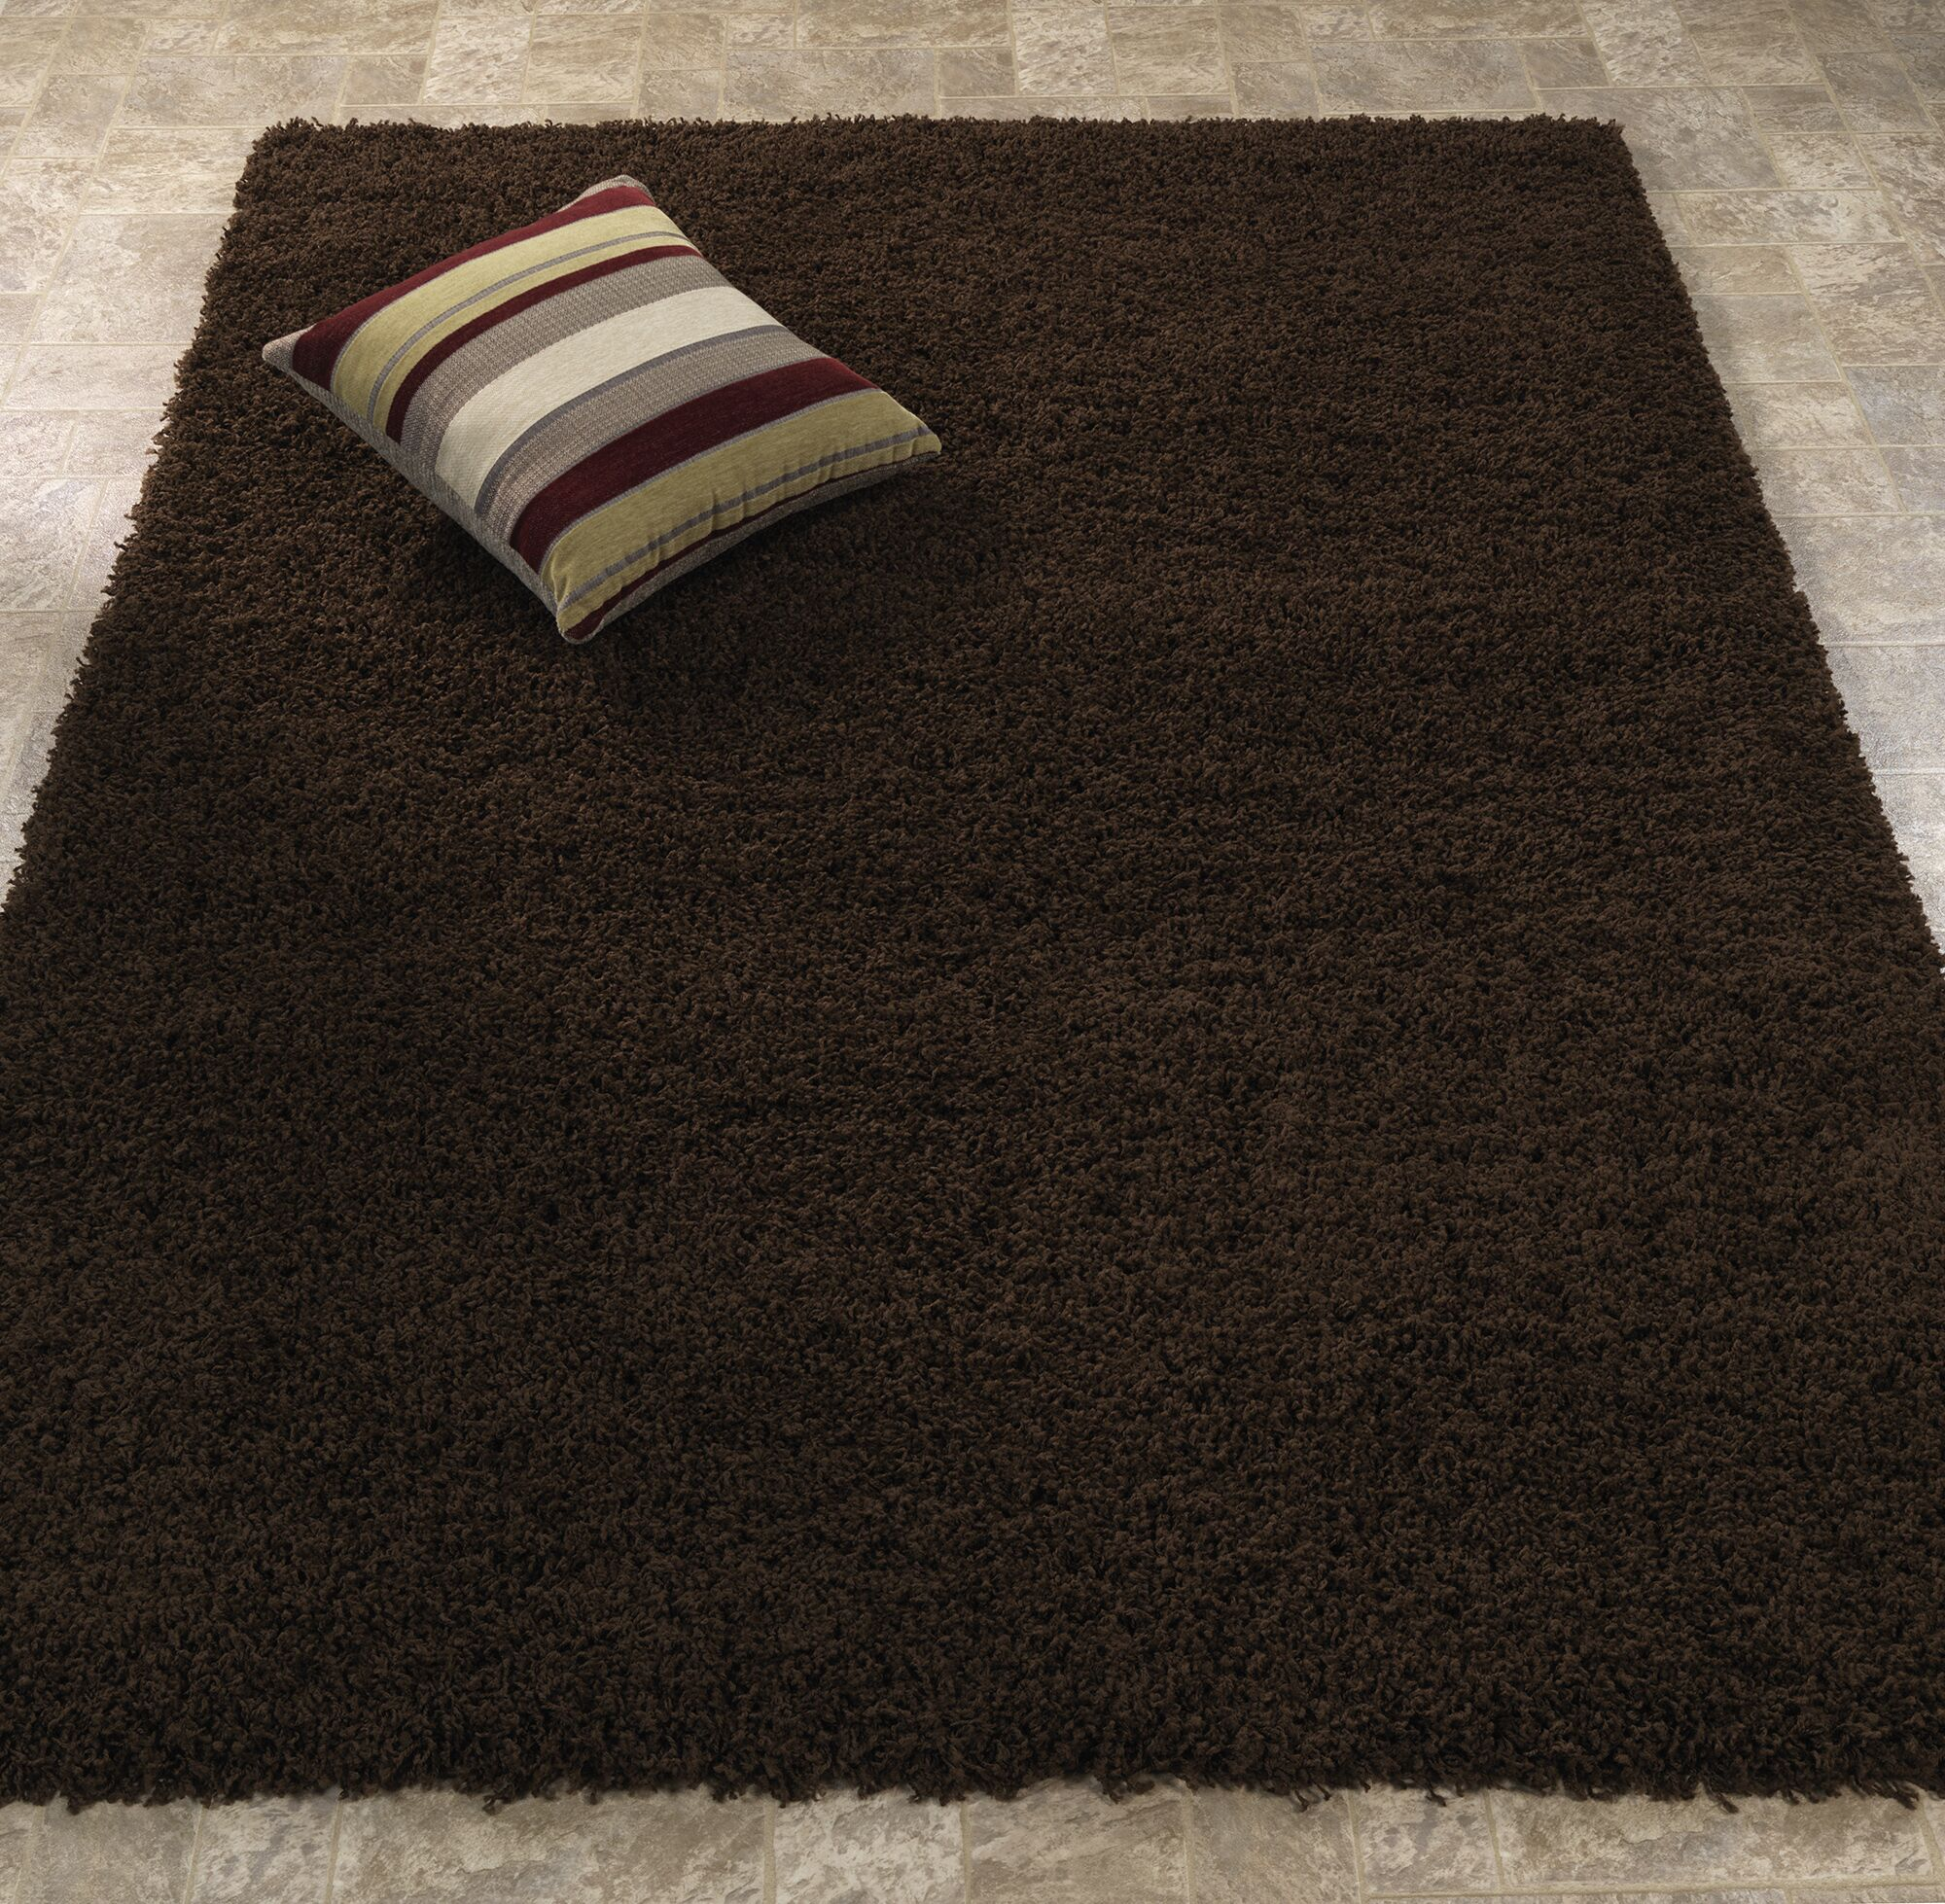 Shiiba Dark Brown Solid Area Rug Rug Size: Rectangle 5'3